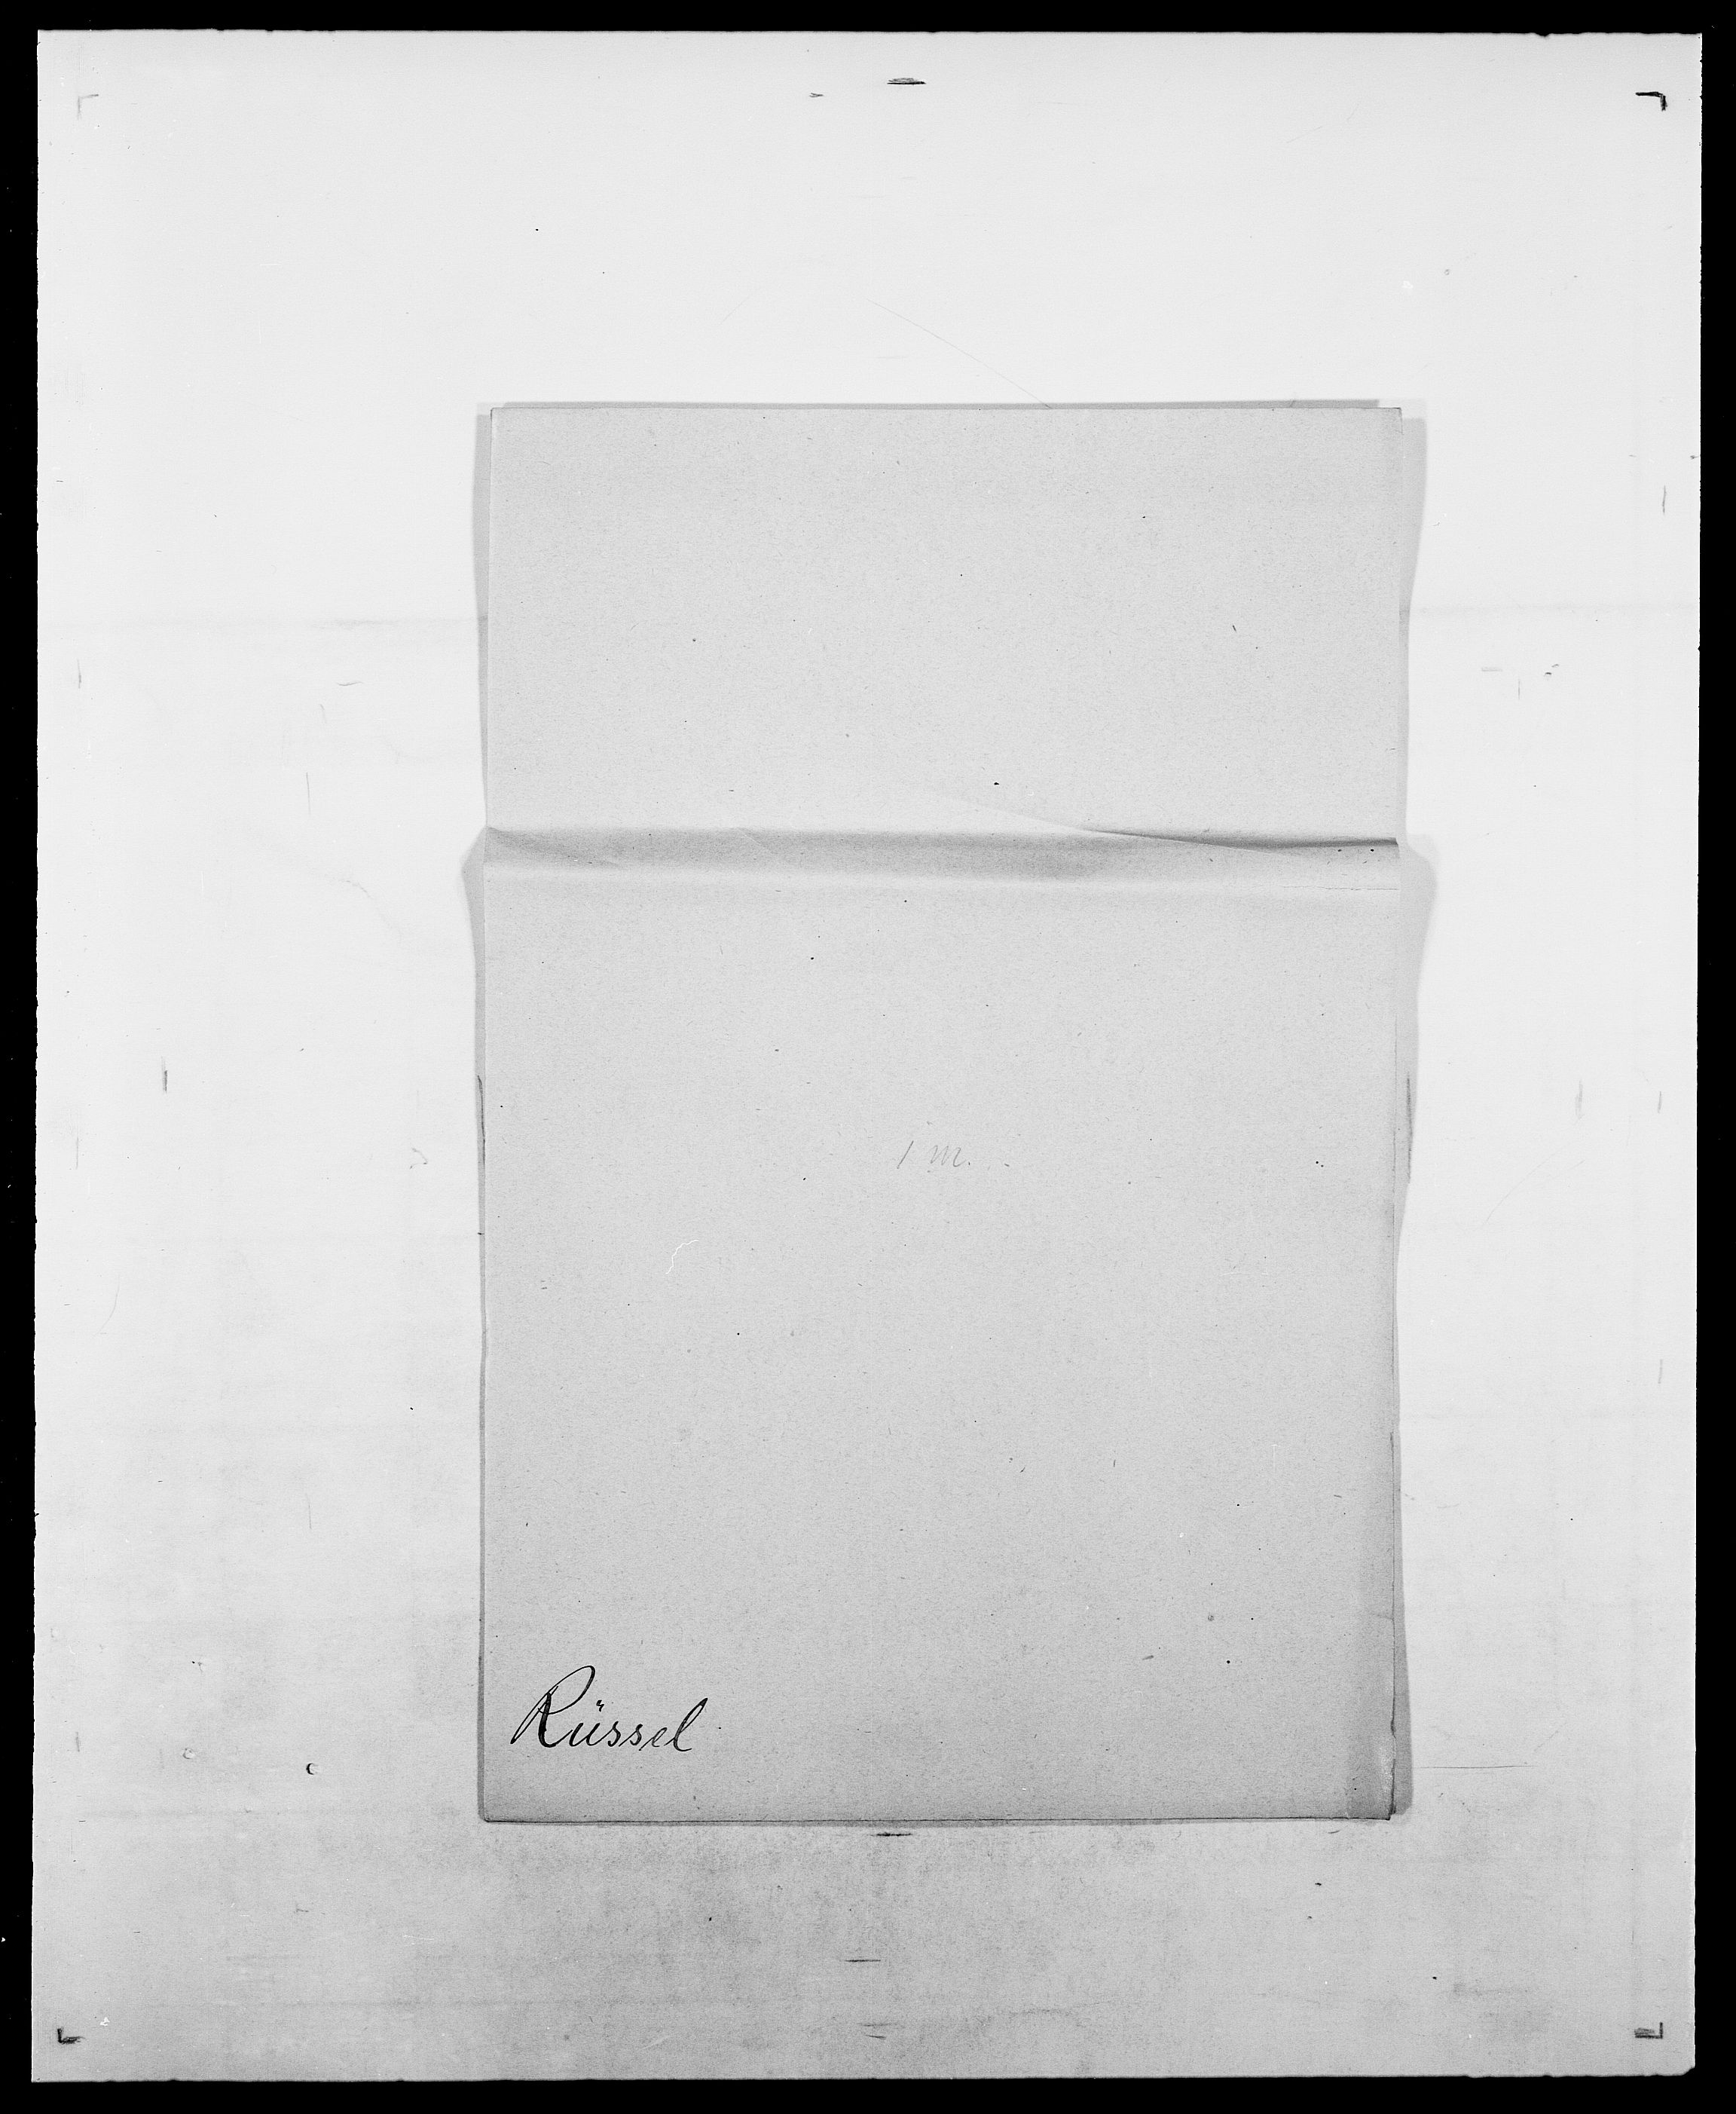 SAO, Delgobe, Charles Antoine - samling, D/Da/L0033: Roald - Røyem, s. 589